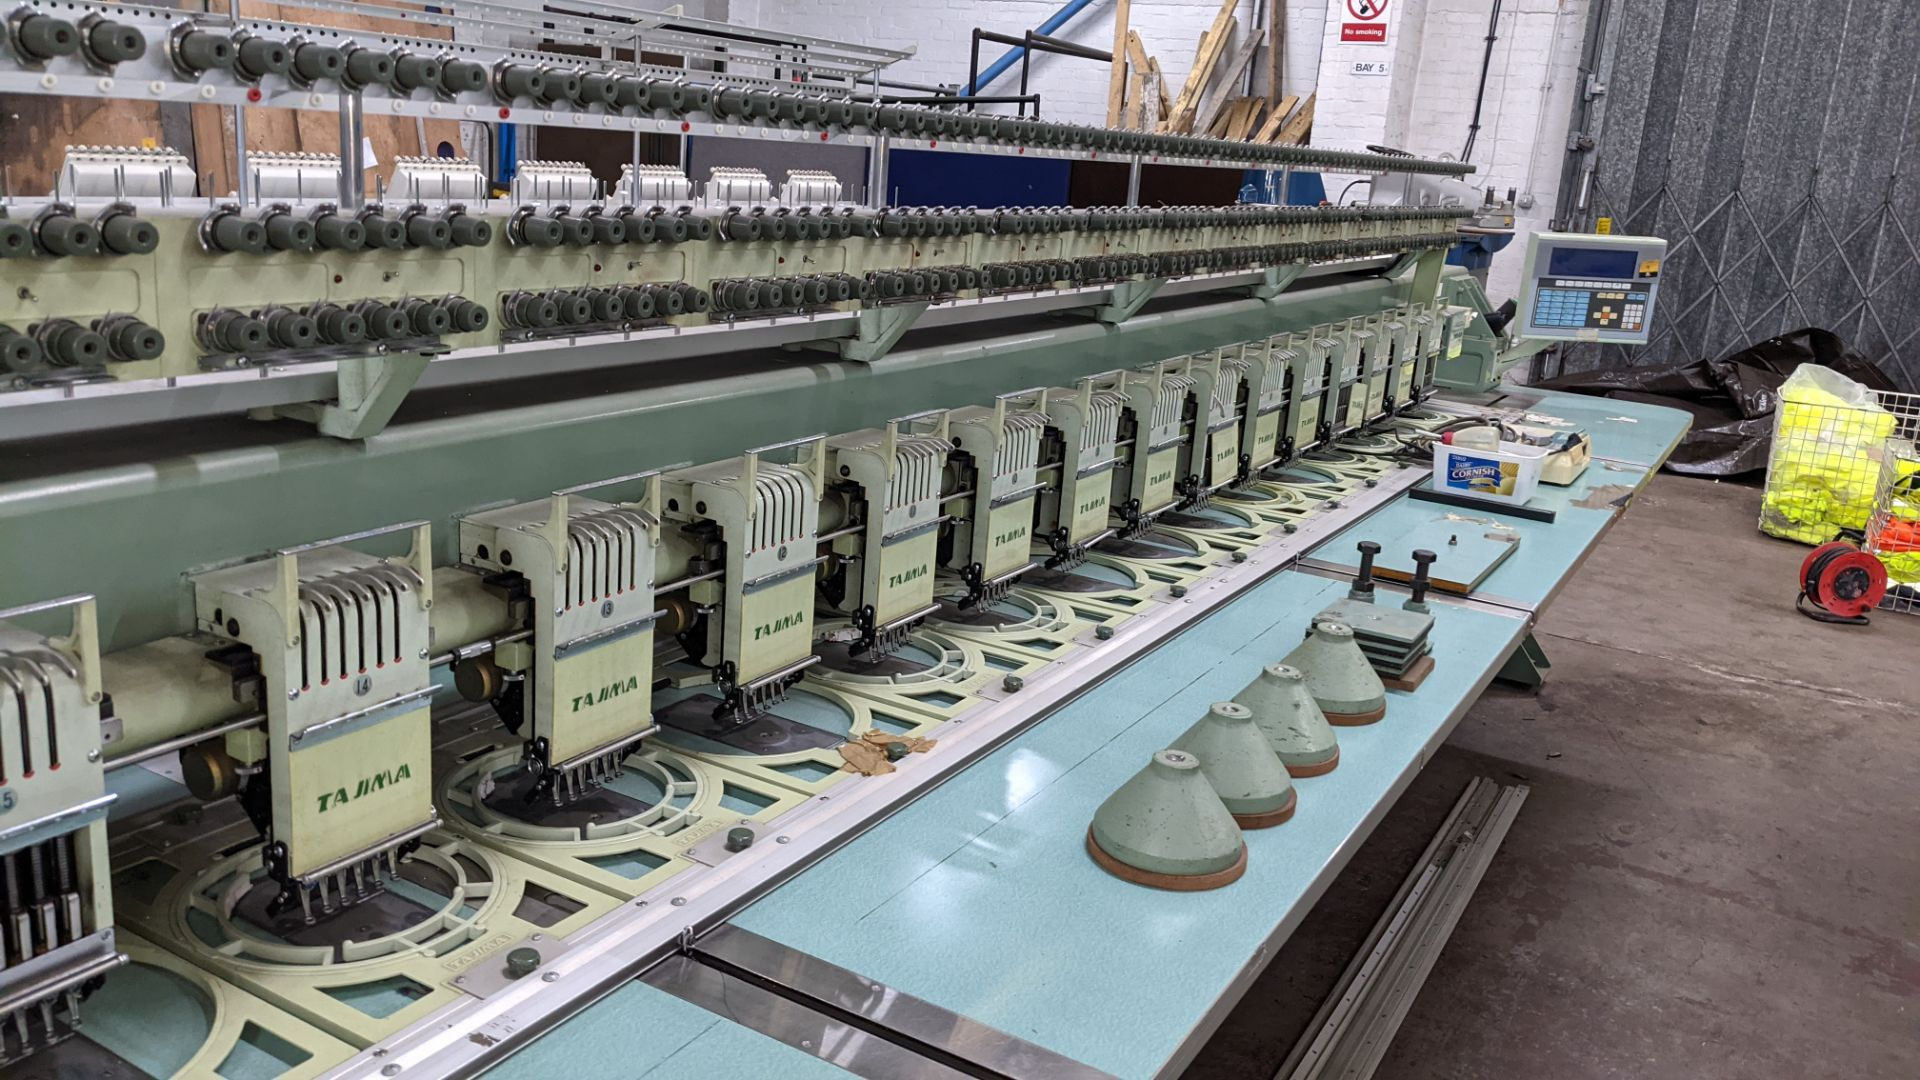 Tokai Tajima electronic 20 head automatic embroidery machine model TMEG-G620, manufacturing number 7 - Image 11 of 19